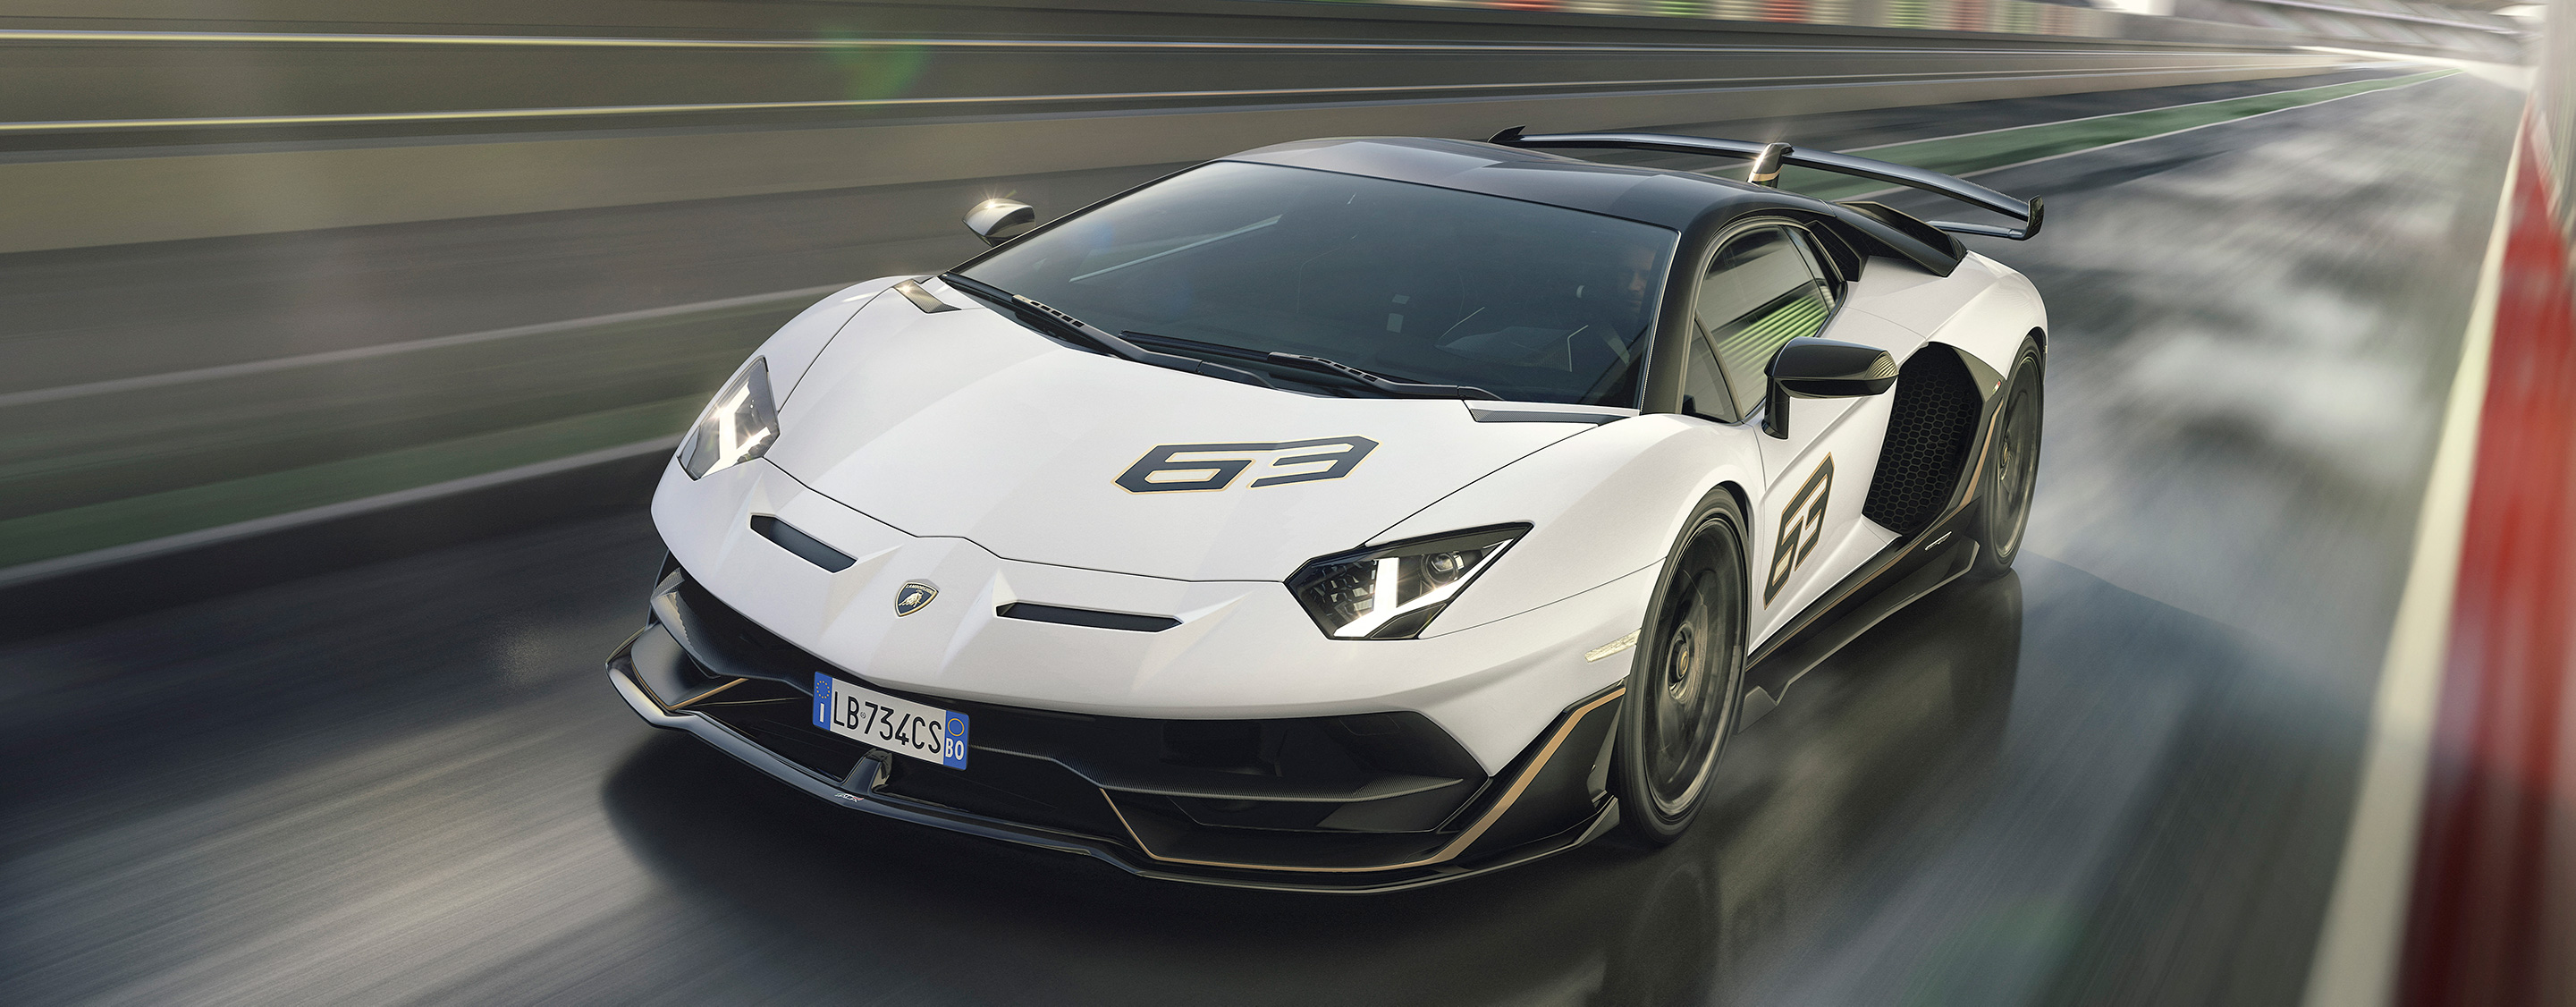 TrackWorthy - Lamborghini Aventador SVJ 63 (1)